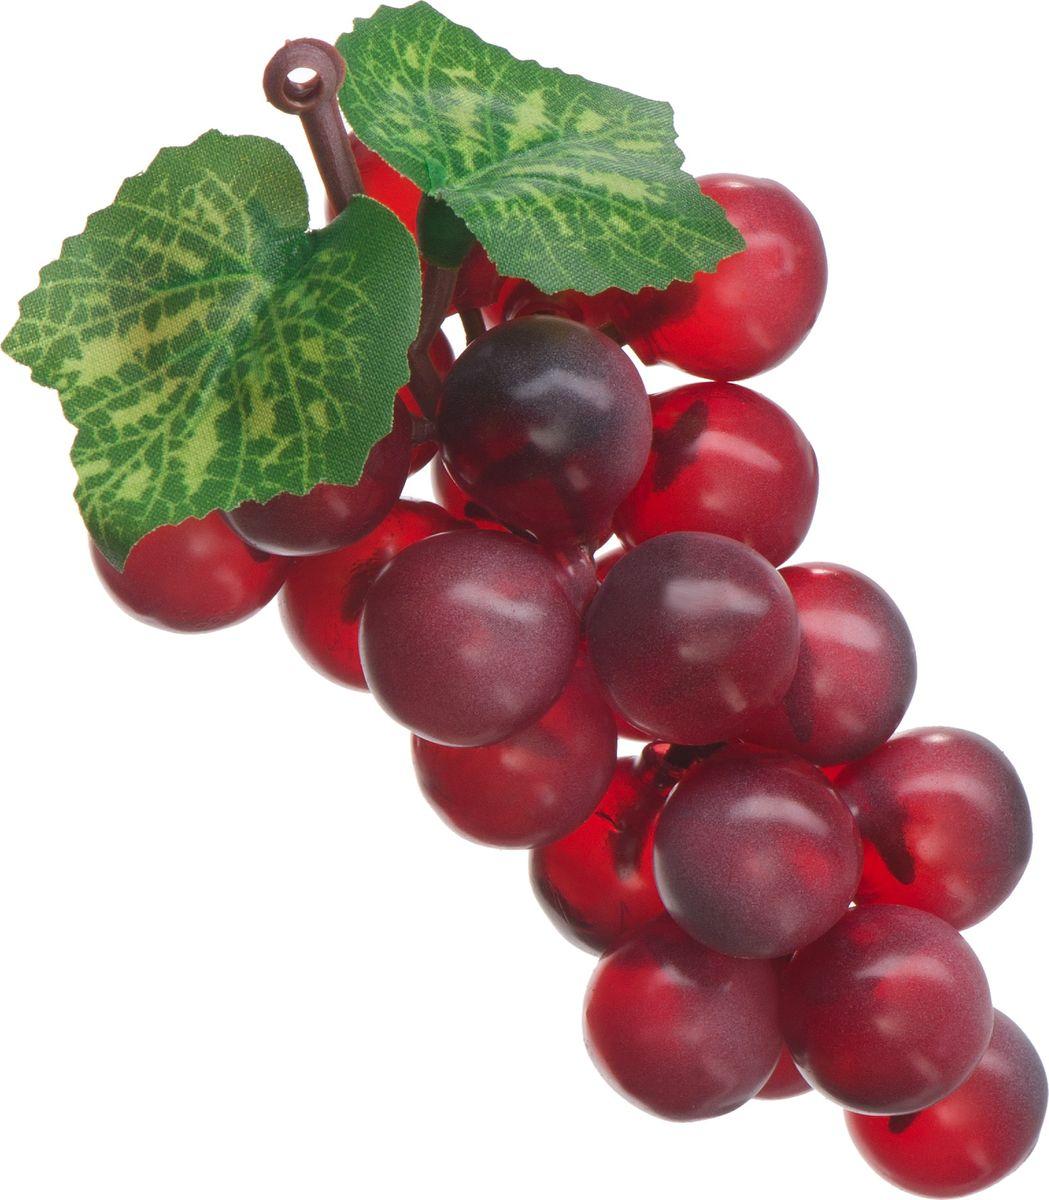 Муляж Engard Гроздь винограда, 14 см фигурки юнион фигурка гроздь винограда